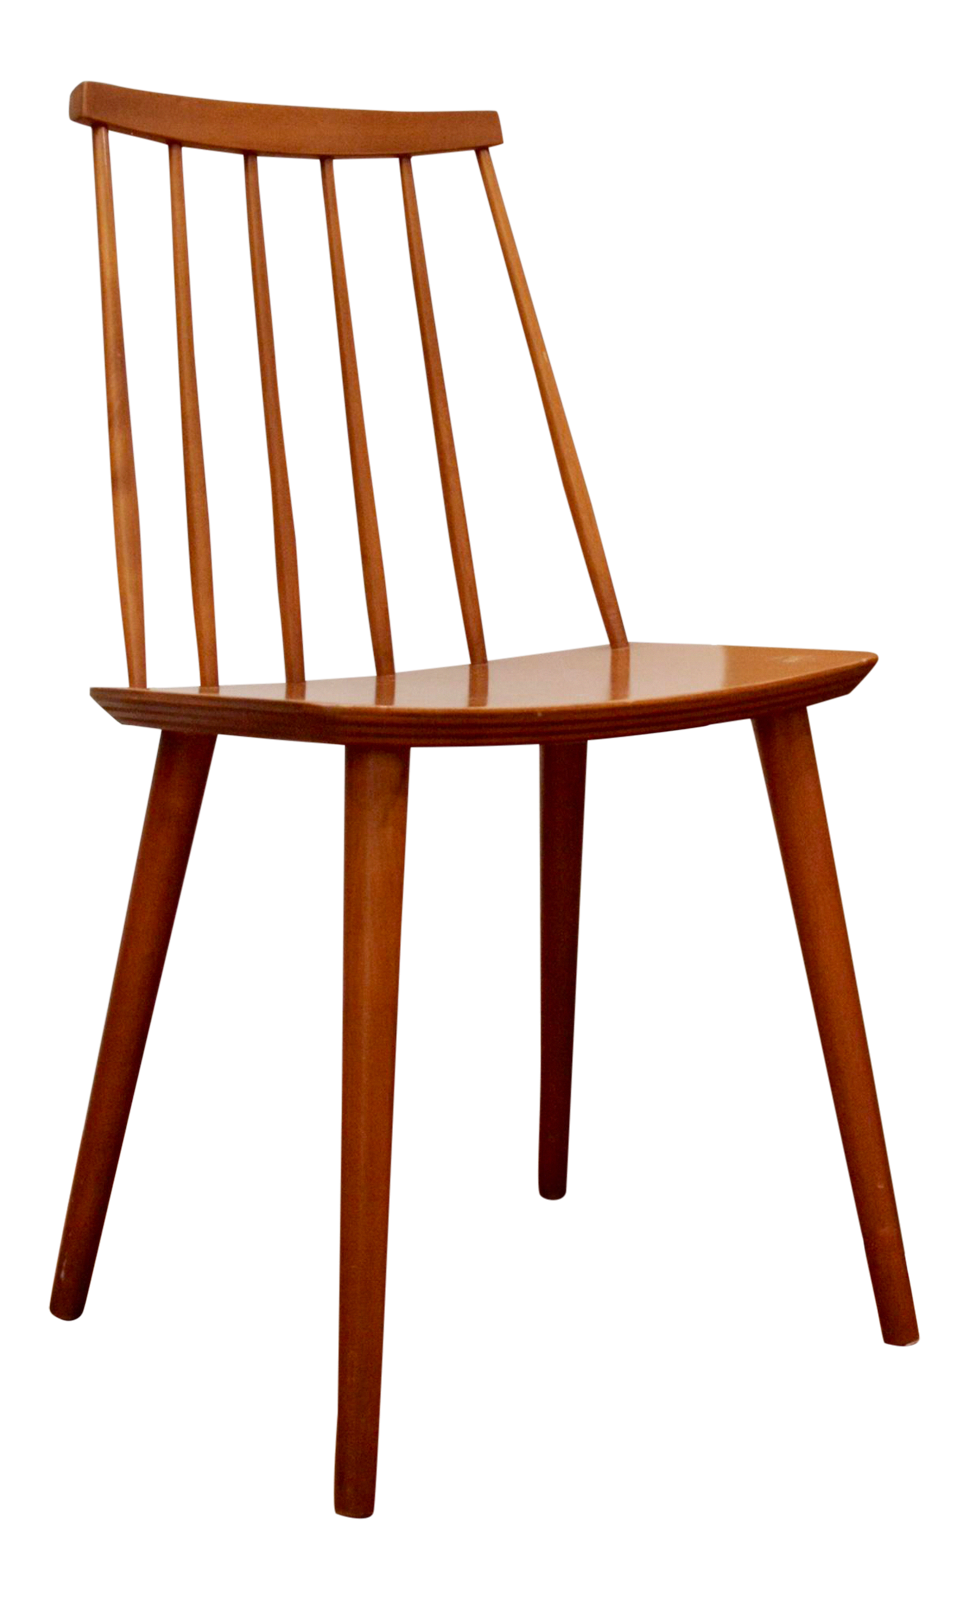 AdirondackChairCushions id6690811998 in 2020 Chair